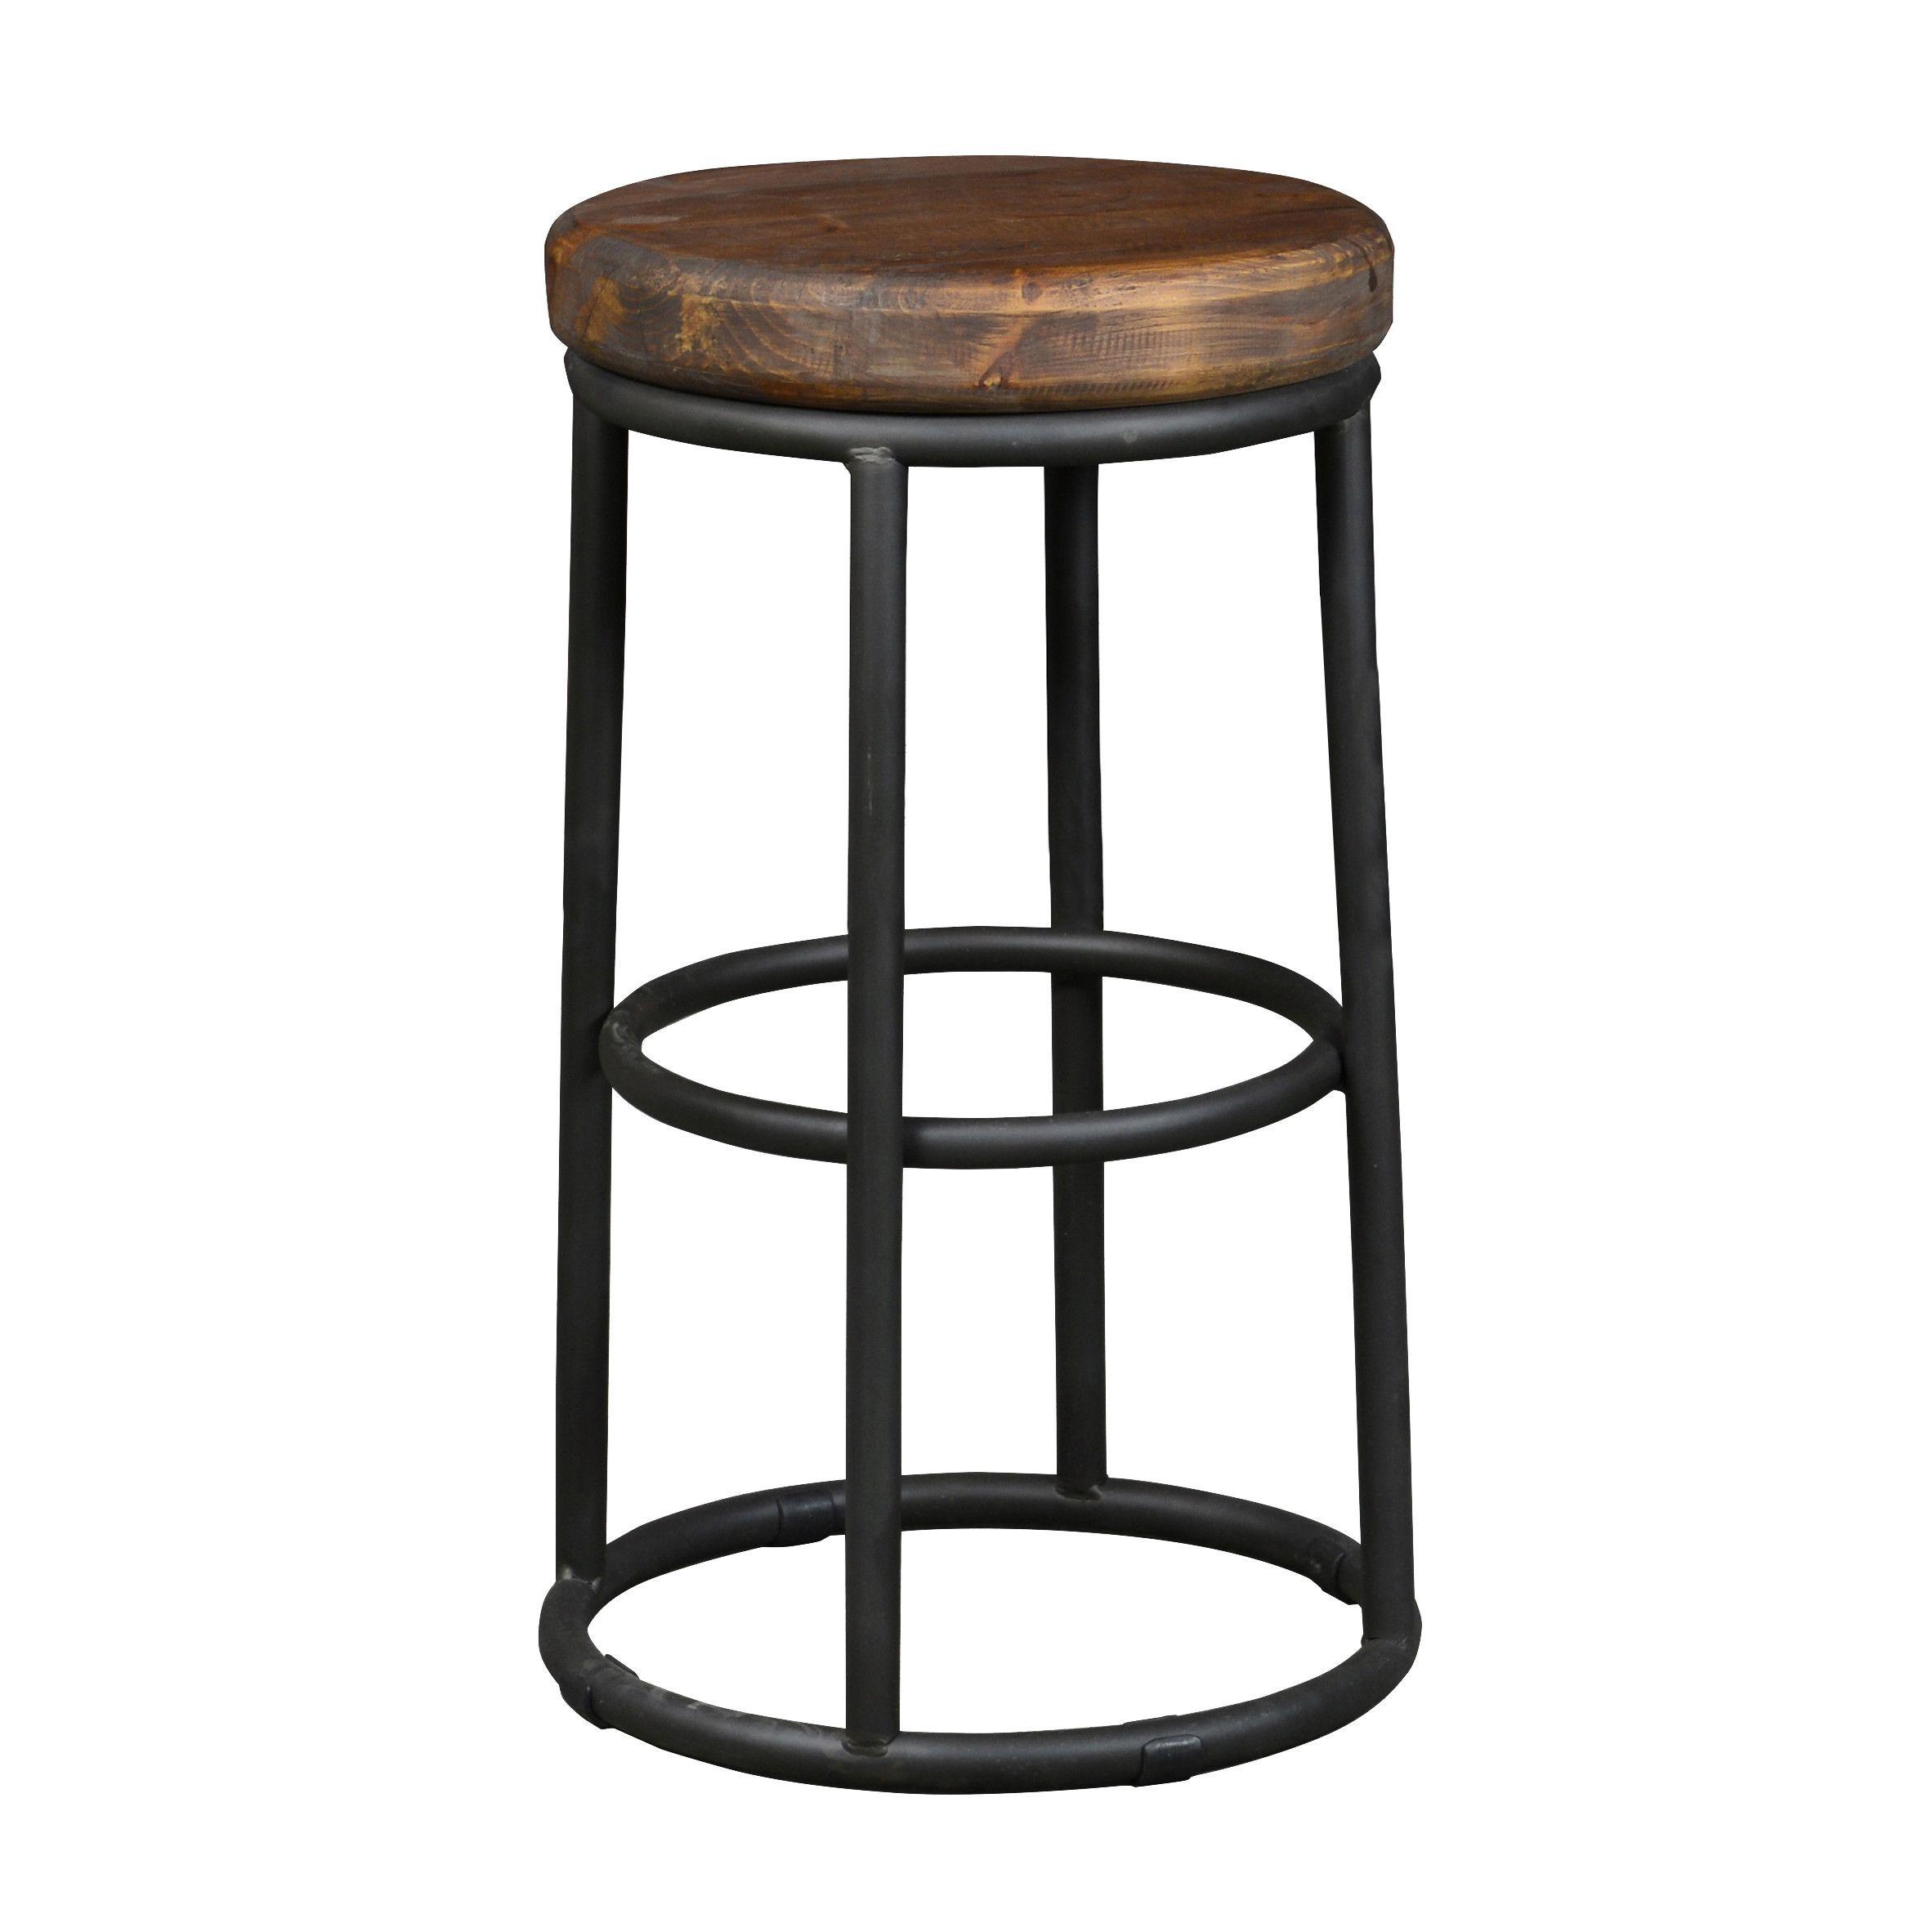 "Trent Austin Design Greenhorn 24"" Bar Stool Cuisine"